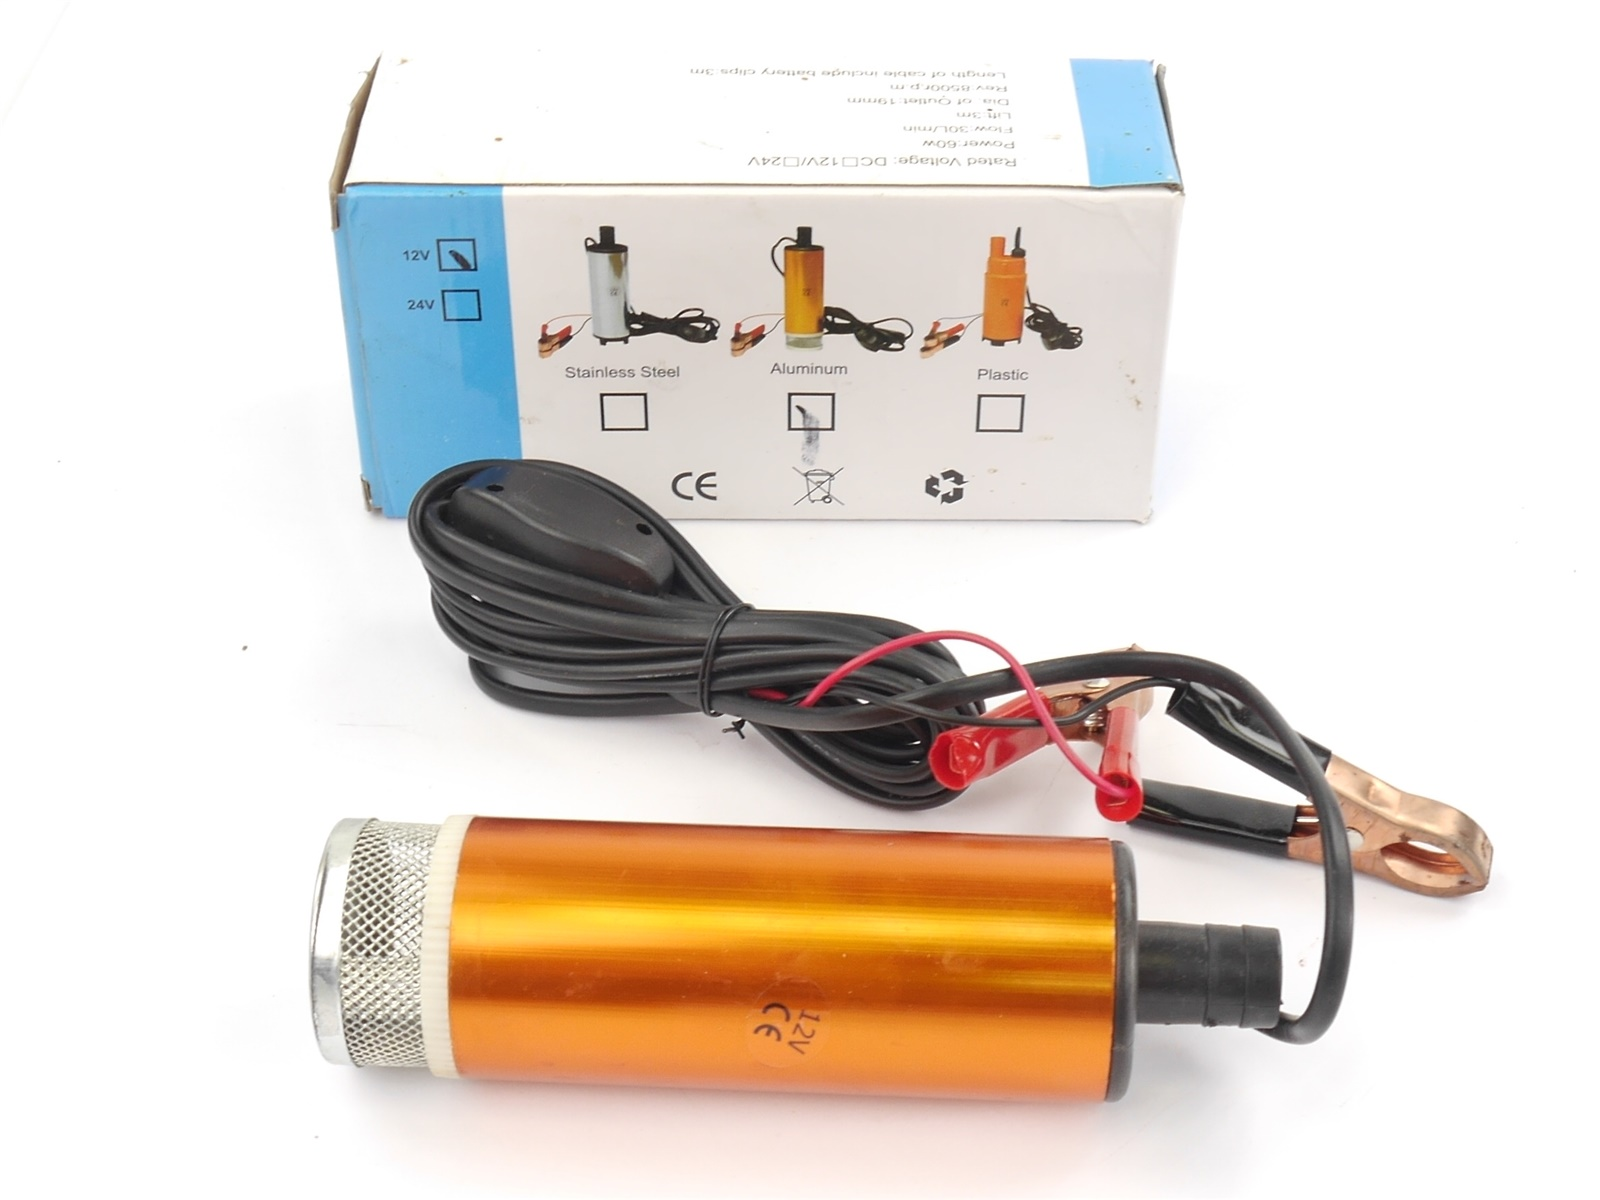 E103 Tauchbare Pumpe Dieselpumpe aus Aluminium / 12 V DC